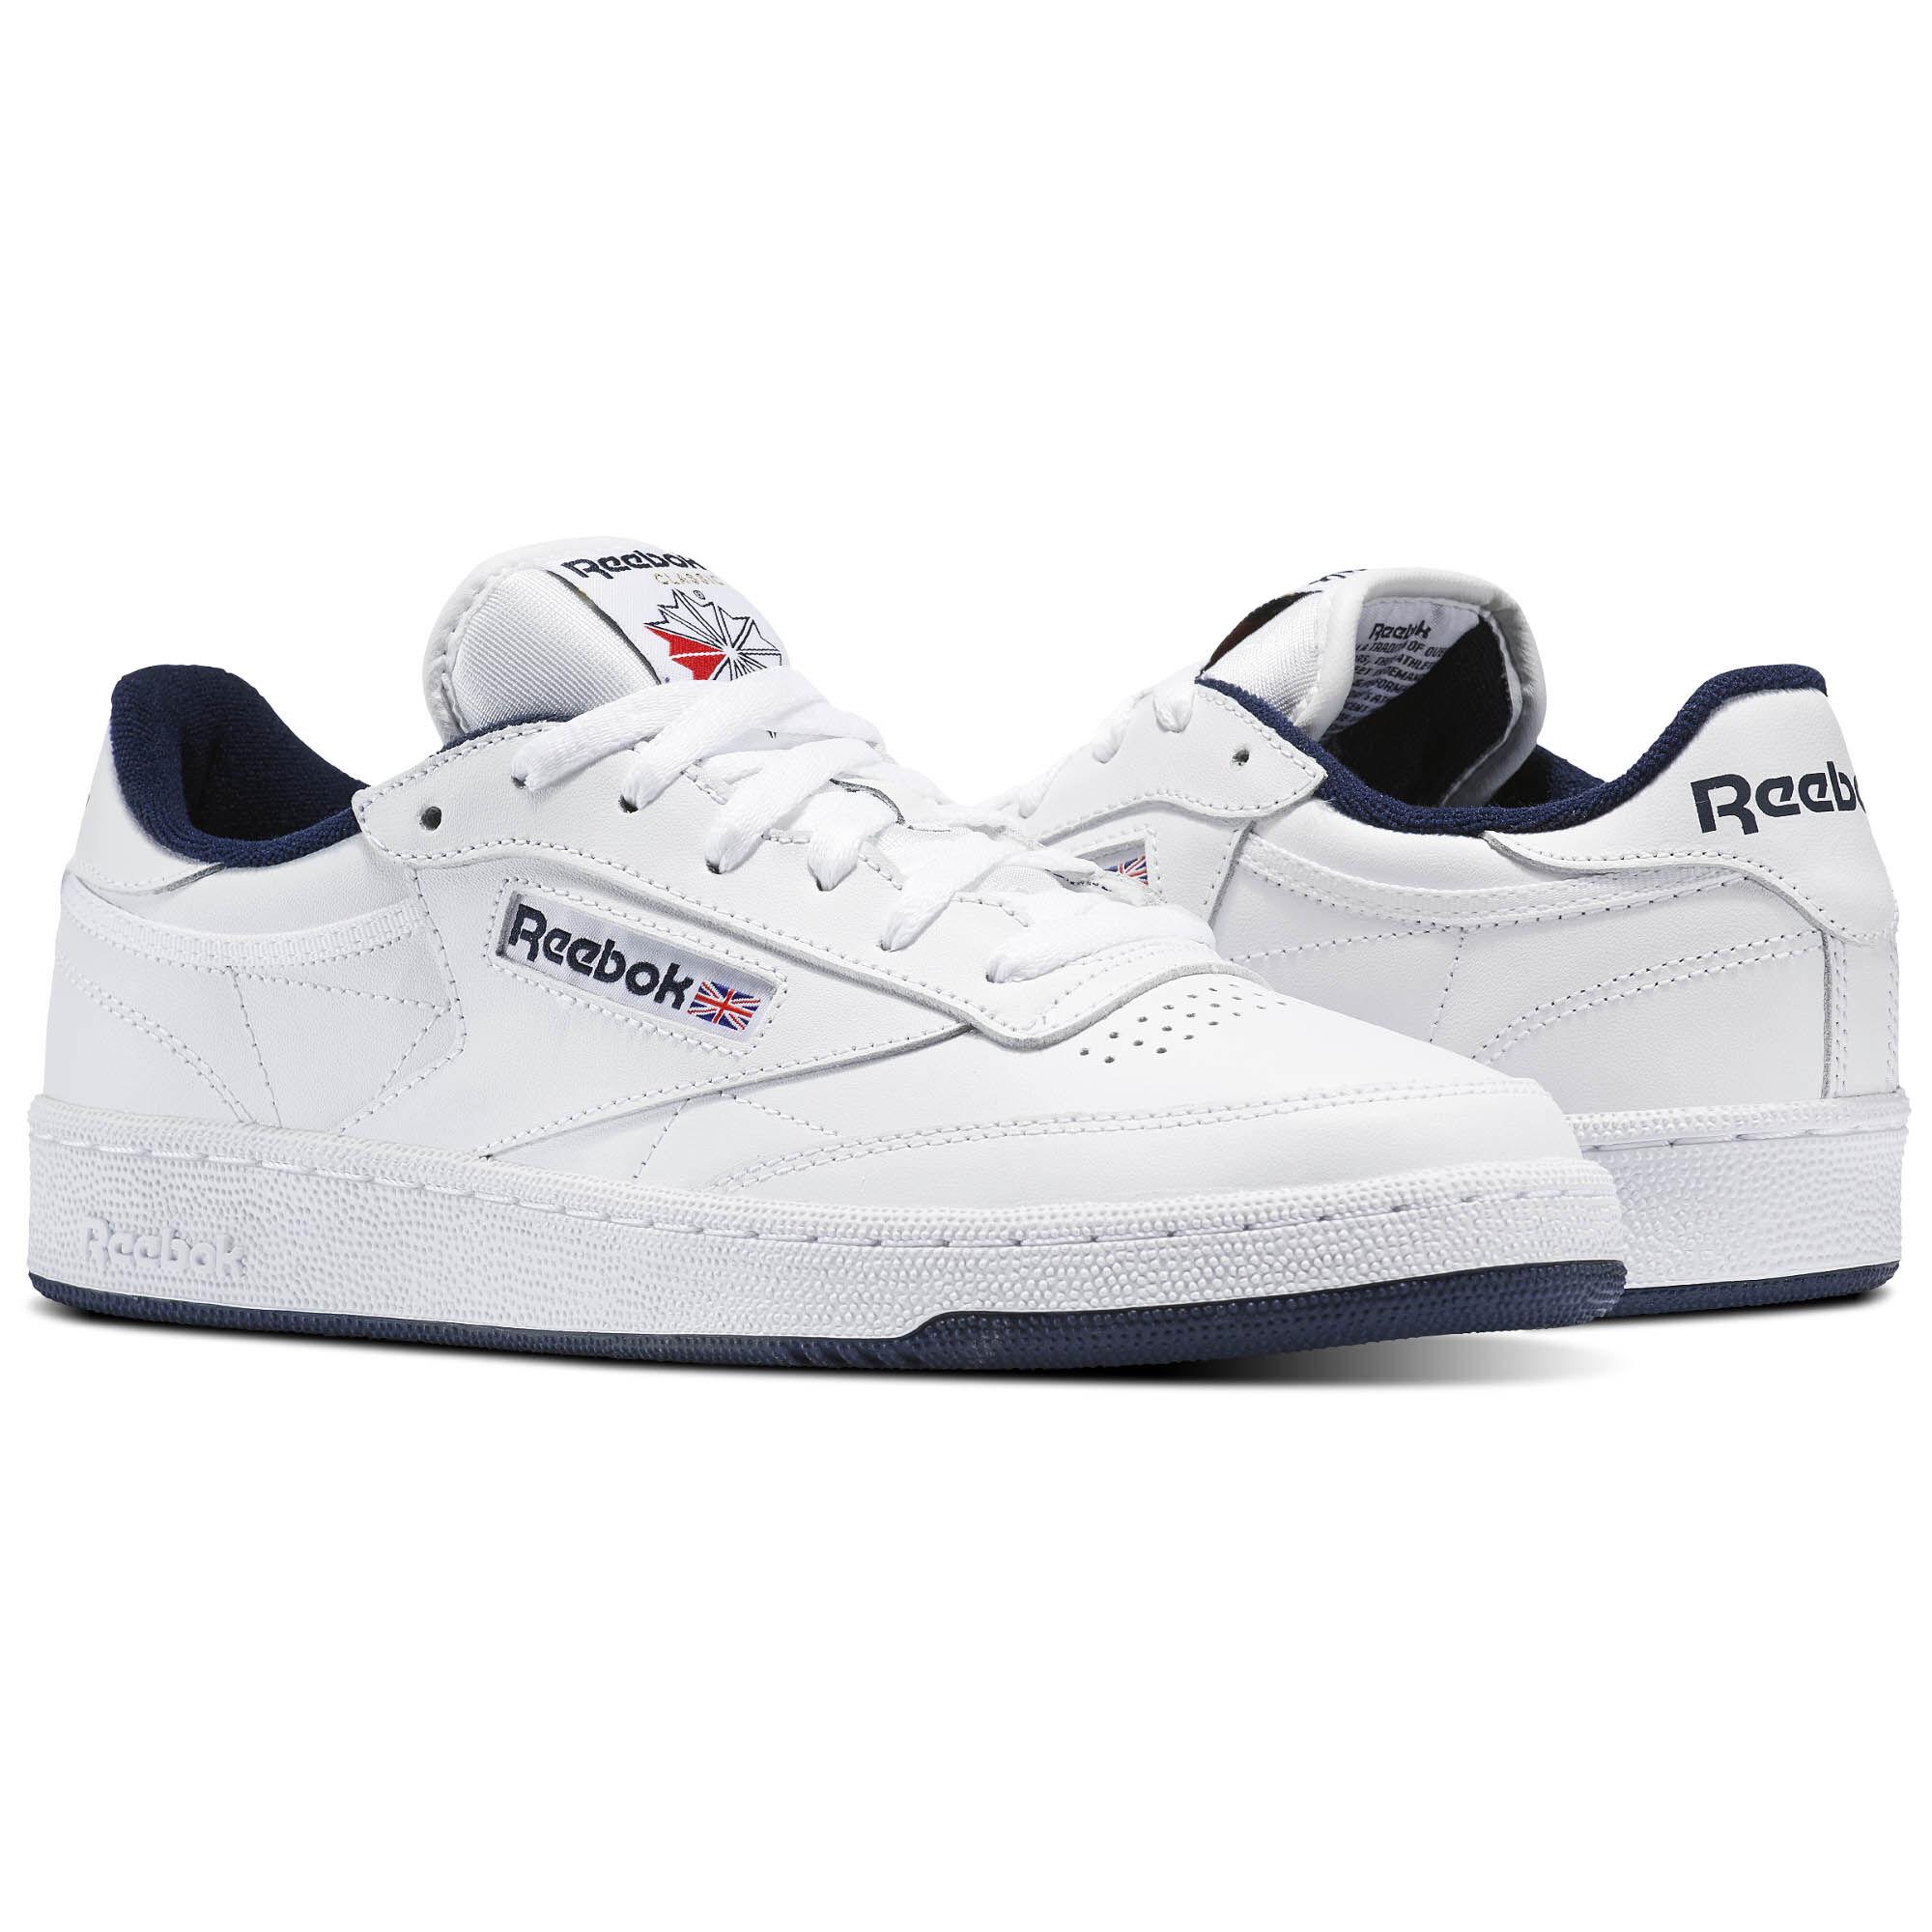 CLUB C 85 - Sneaker low - white/navy imhexJT